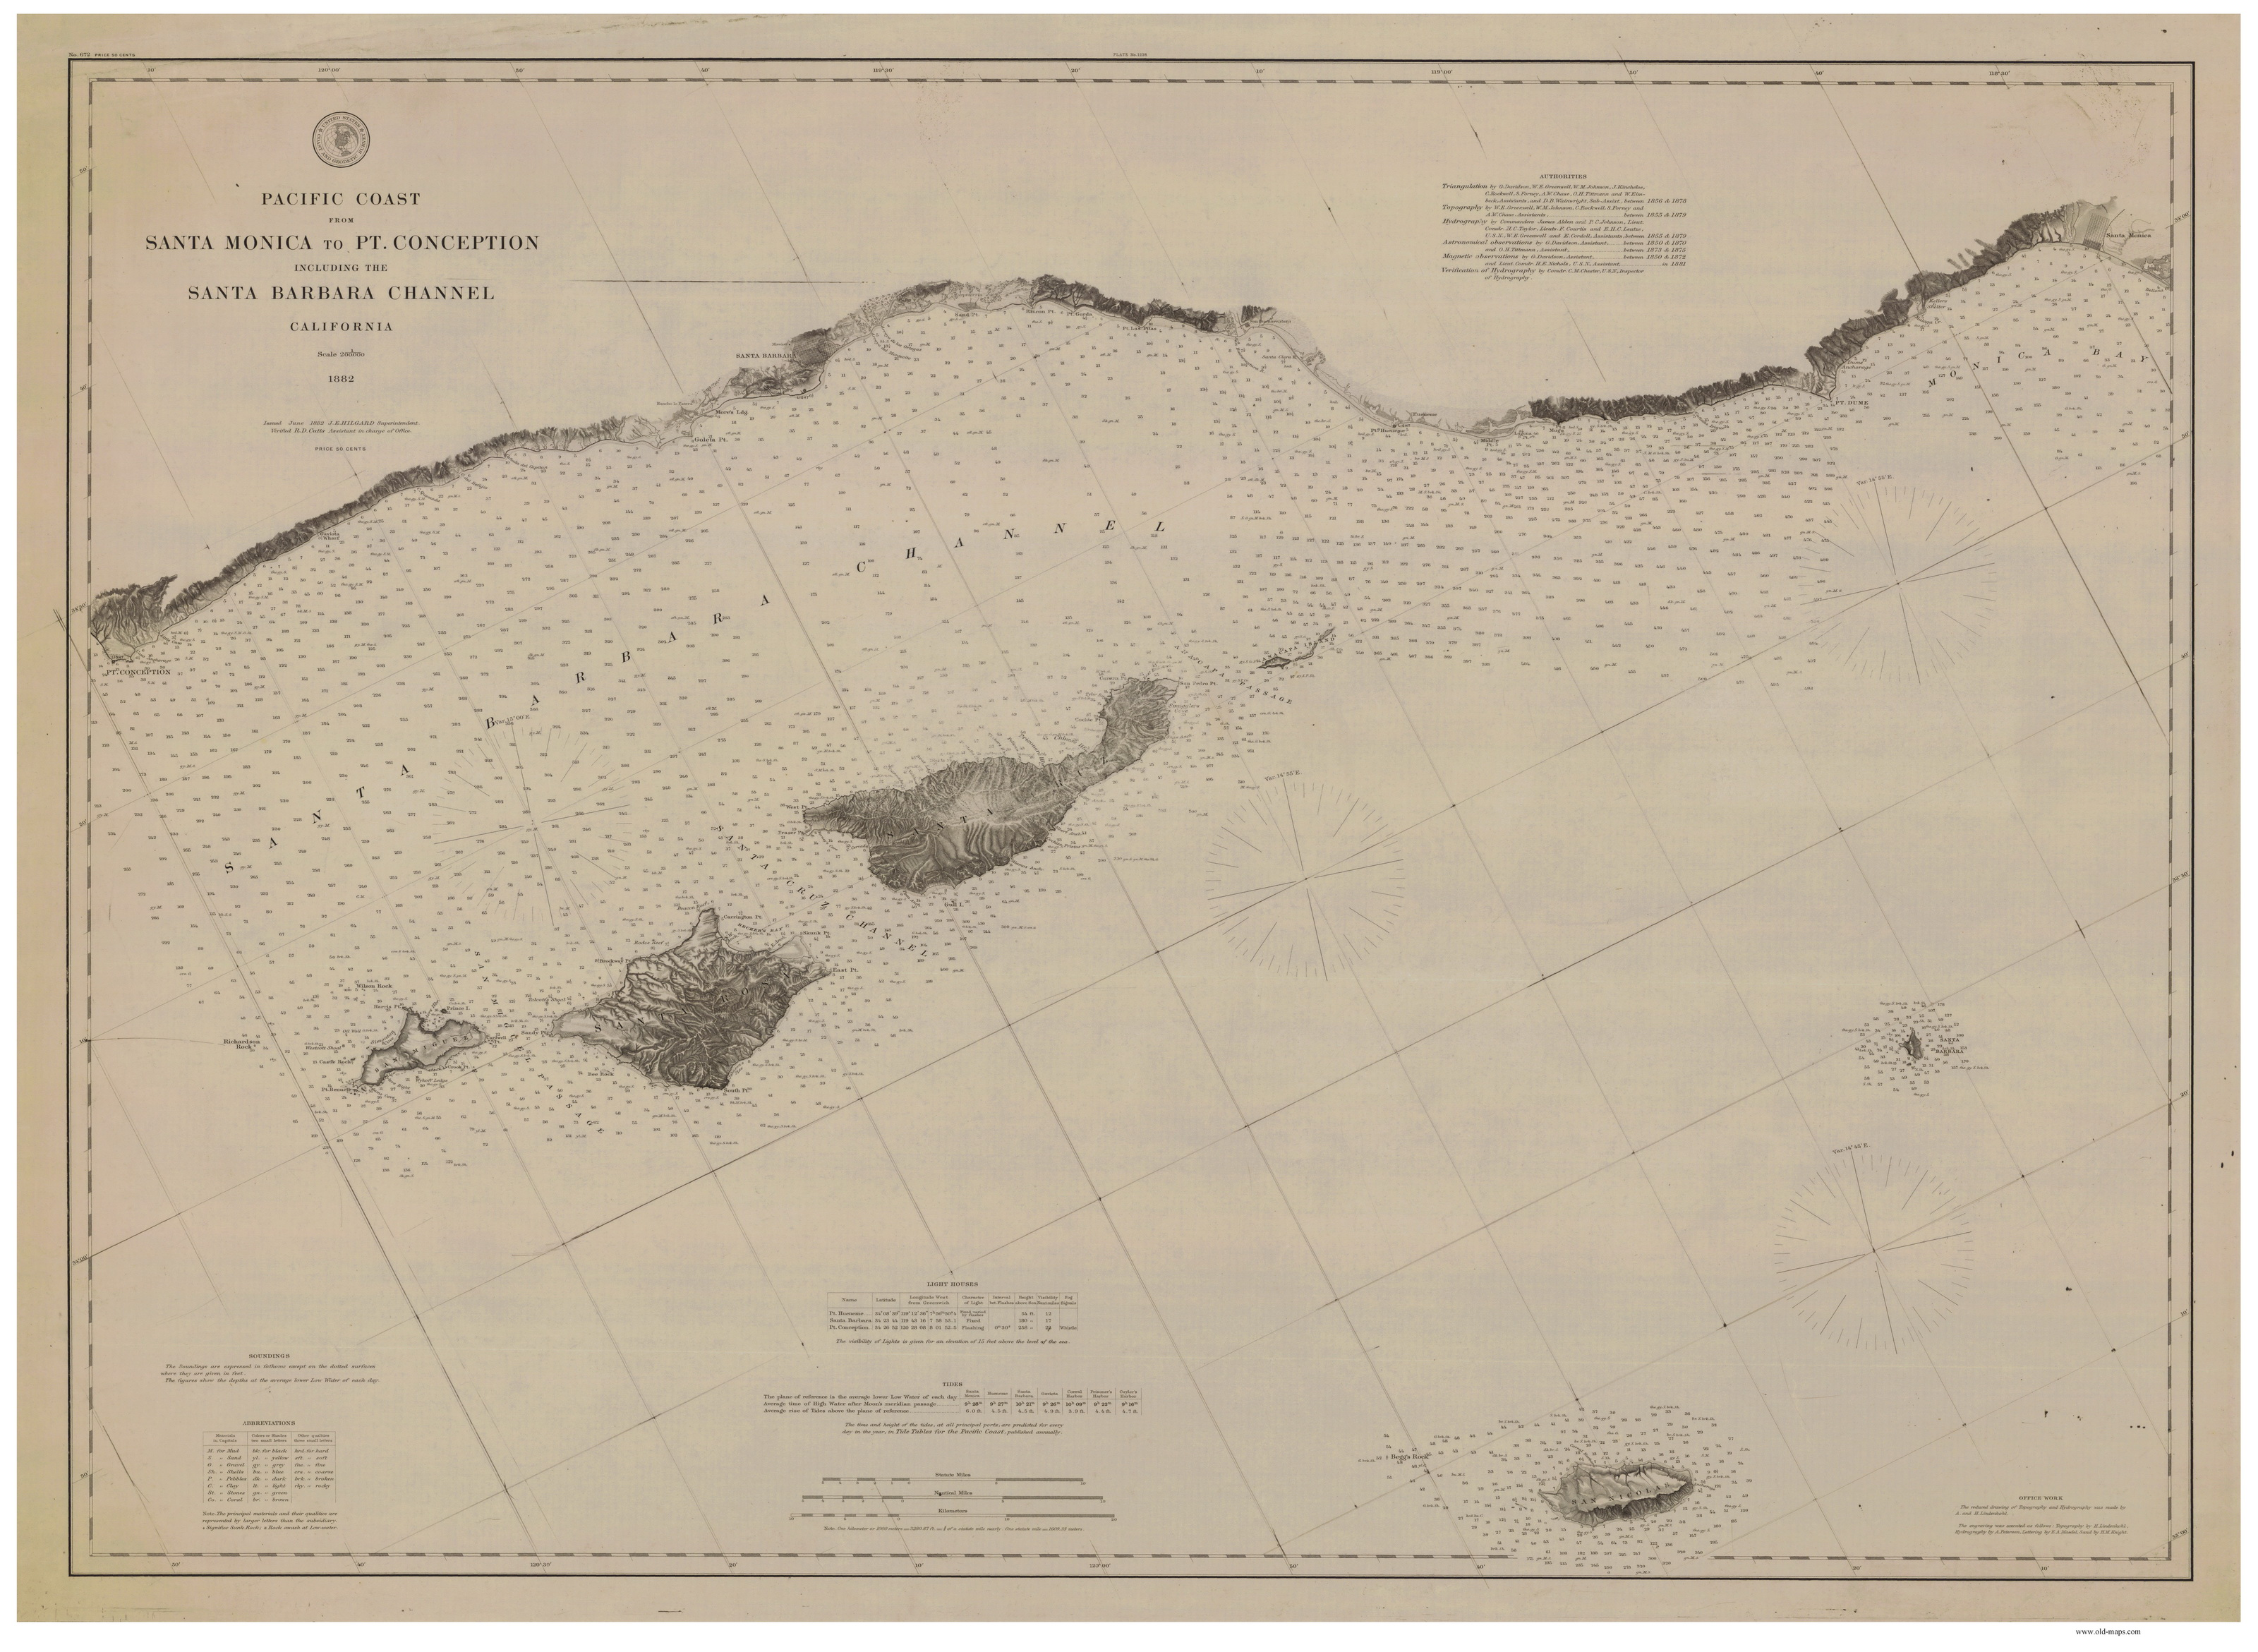 Santa Monica to Point Conception 1882a Nautical Map Reprint 5200